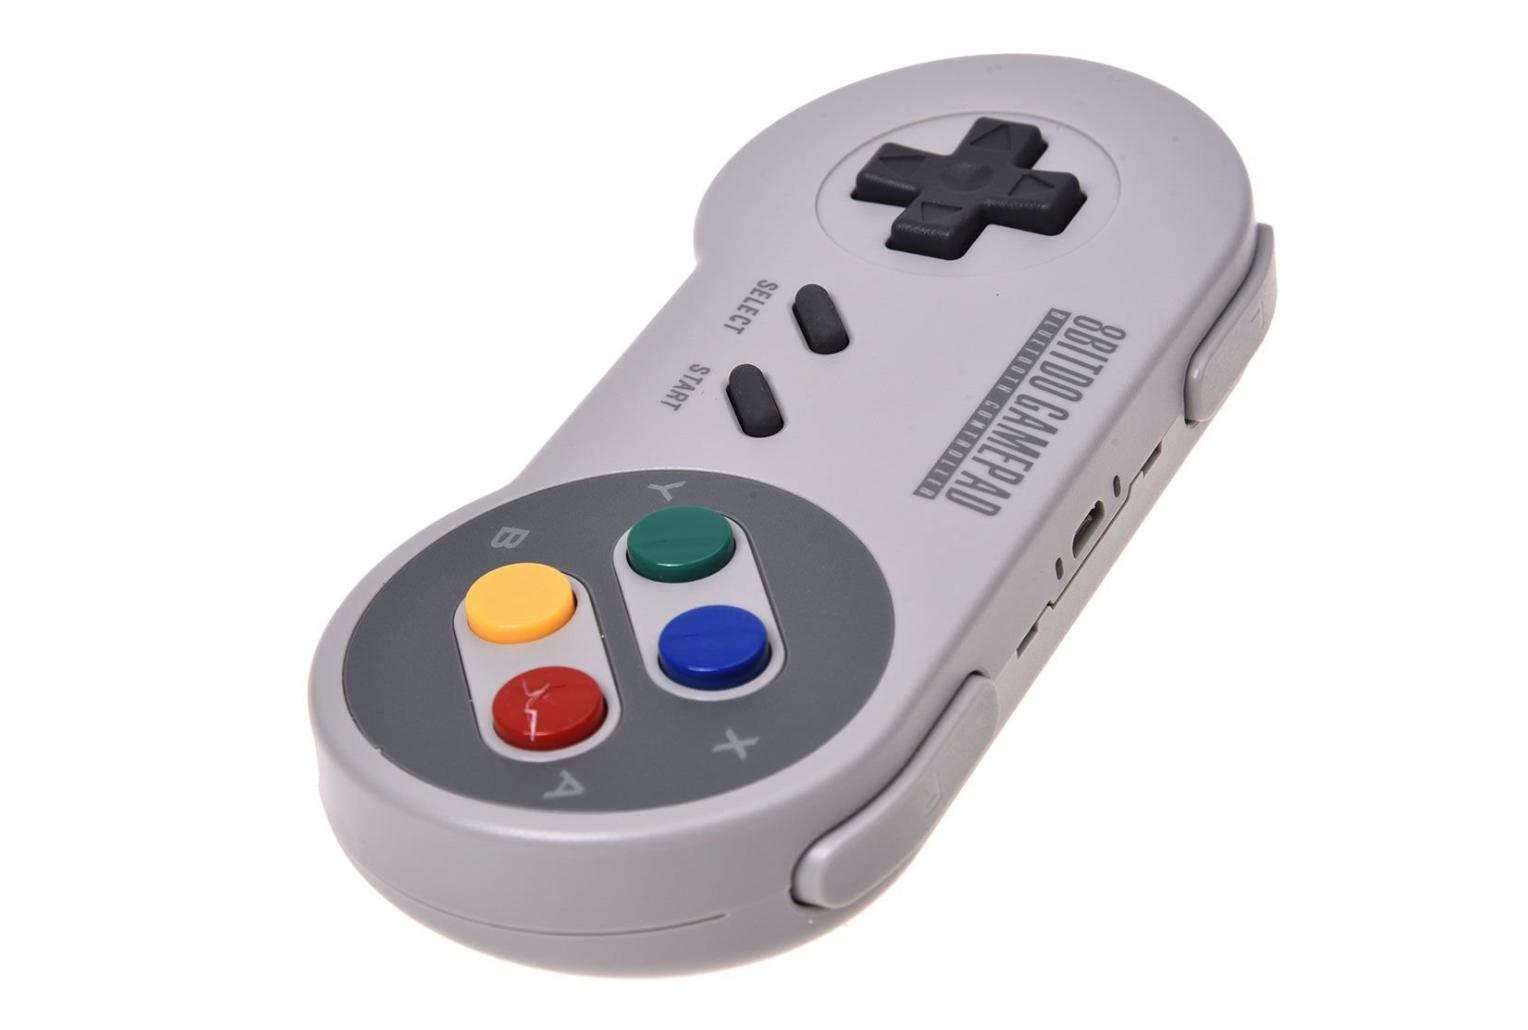 8bitdo retro game controller